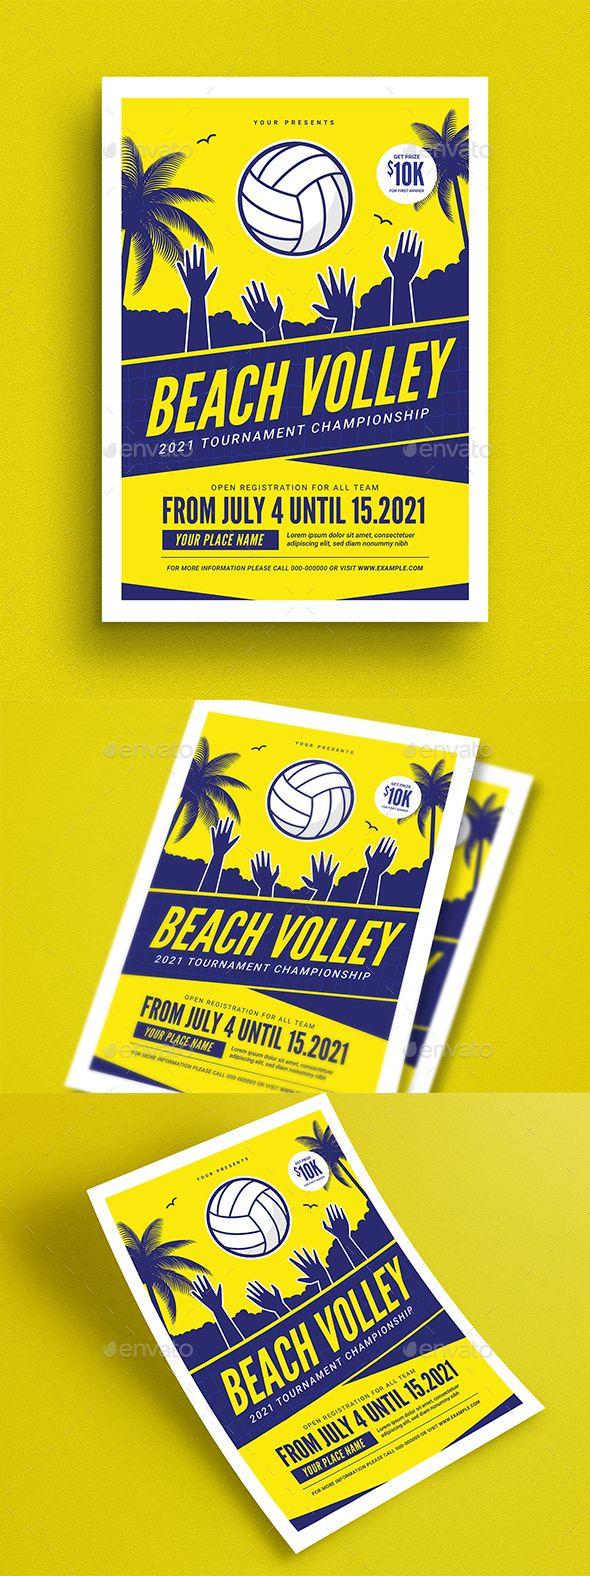 Beach Volleyball Tournament Flyer Volleyball Tournaments Beach Volleyball Volleyball